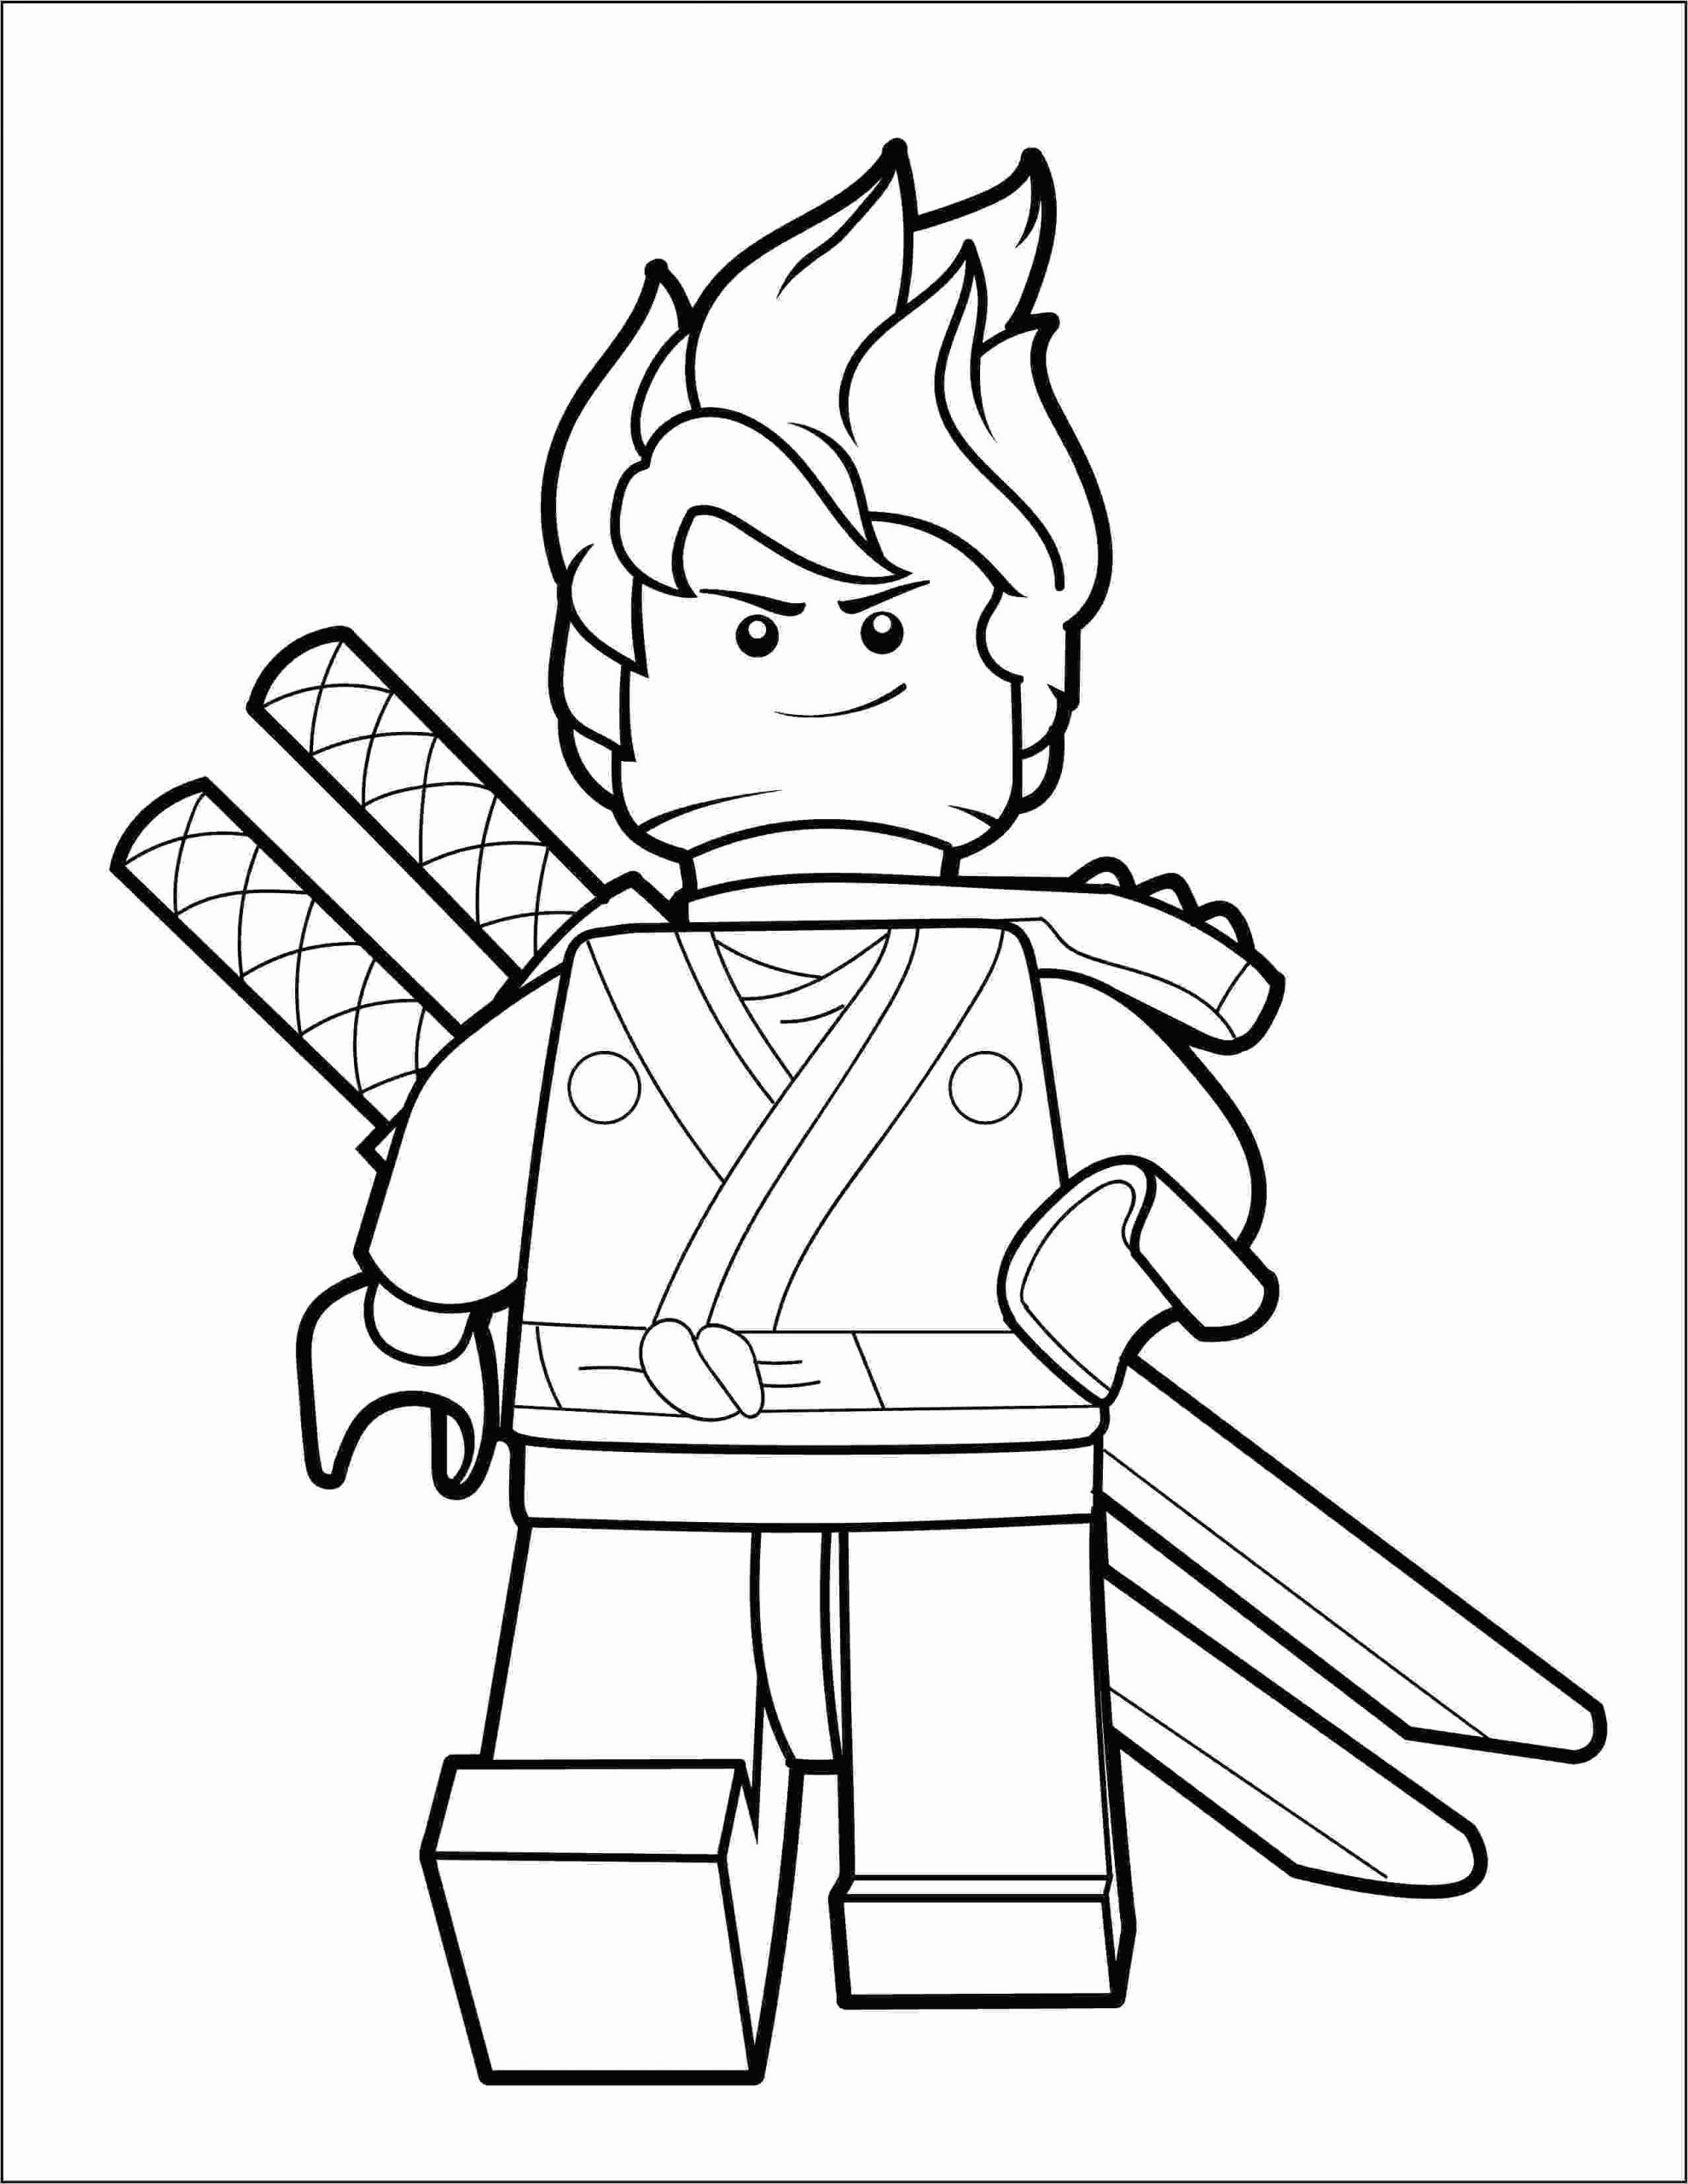 Coloring Page Ninja Jay True North Bricks Ninjago Coloring Pages Lego Coloring Pages Coloring Pages